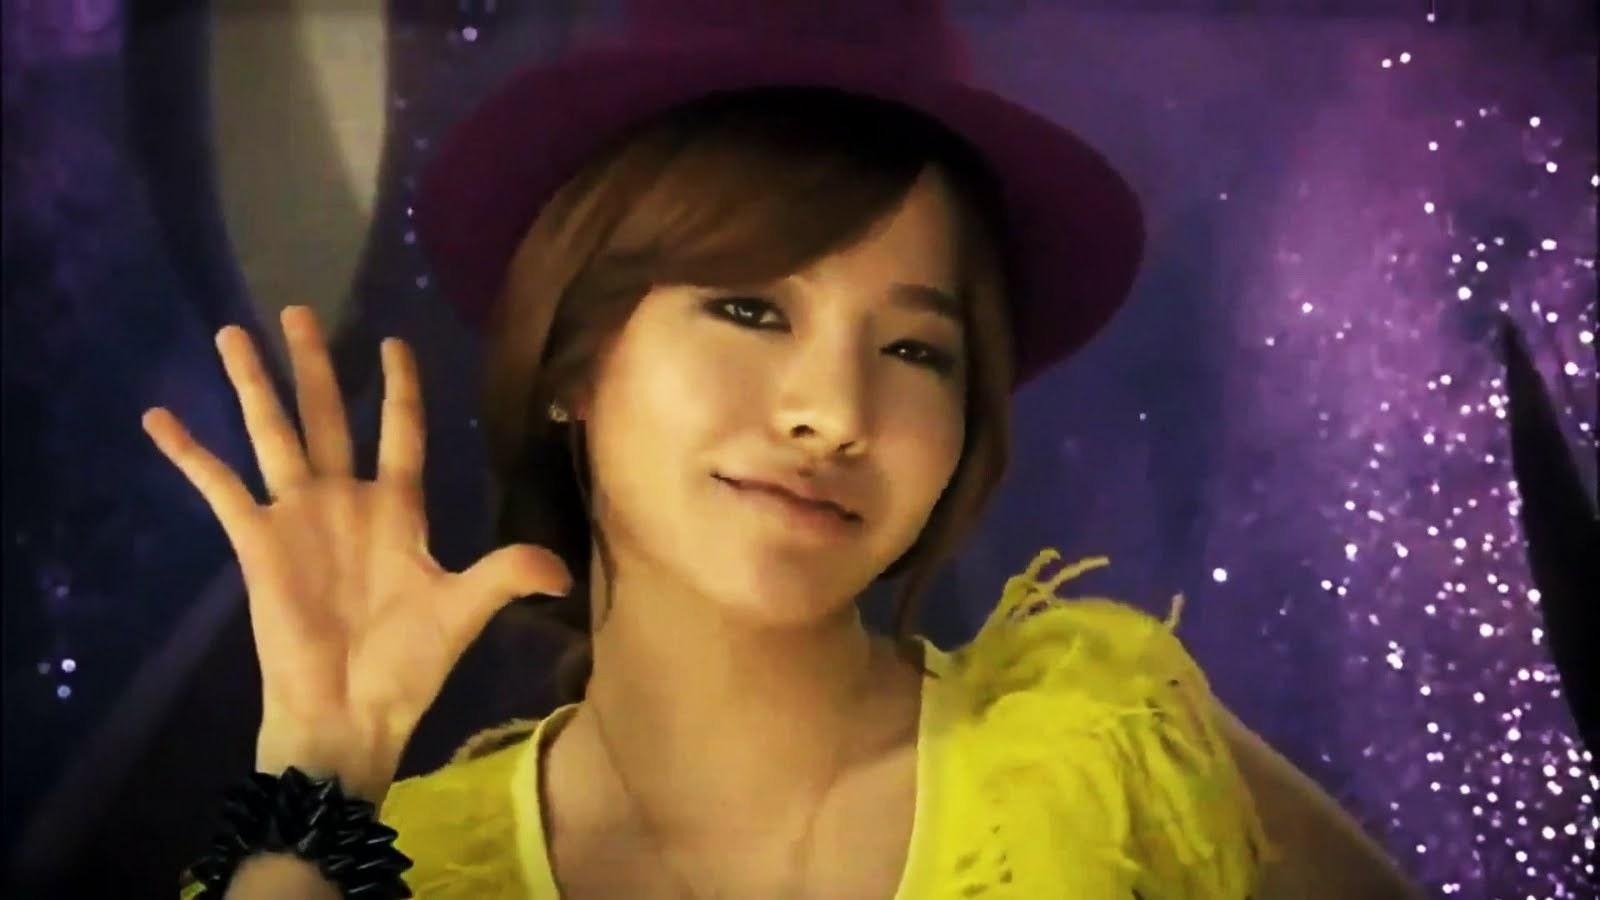 Sunny Lee Net Worth